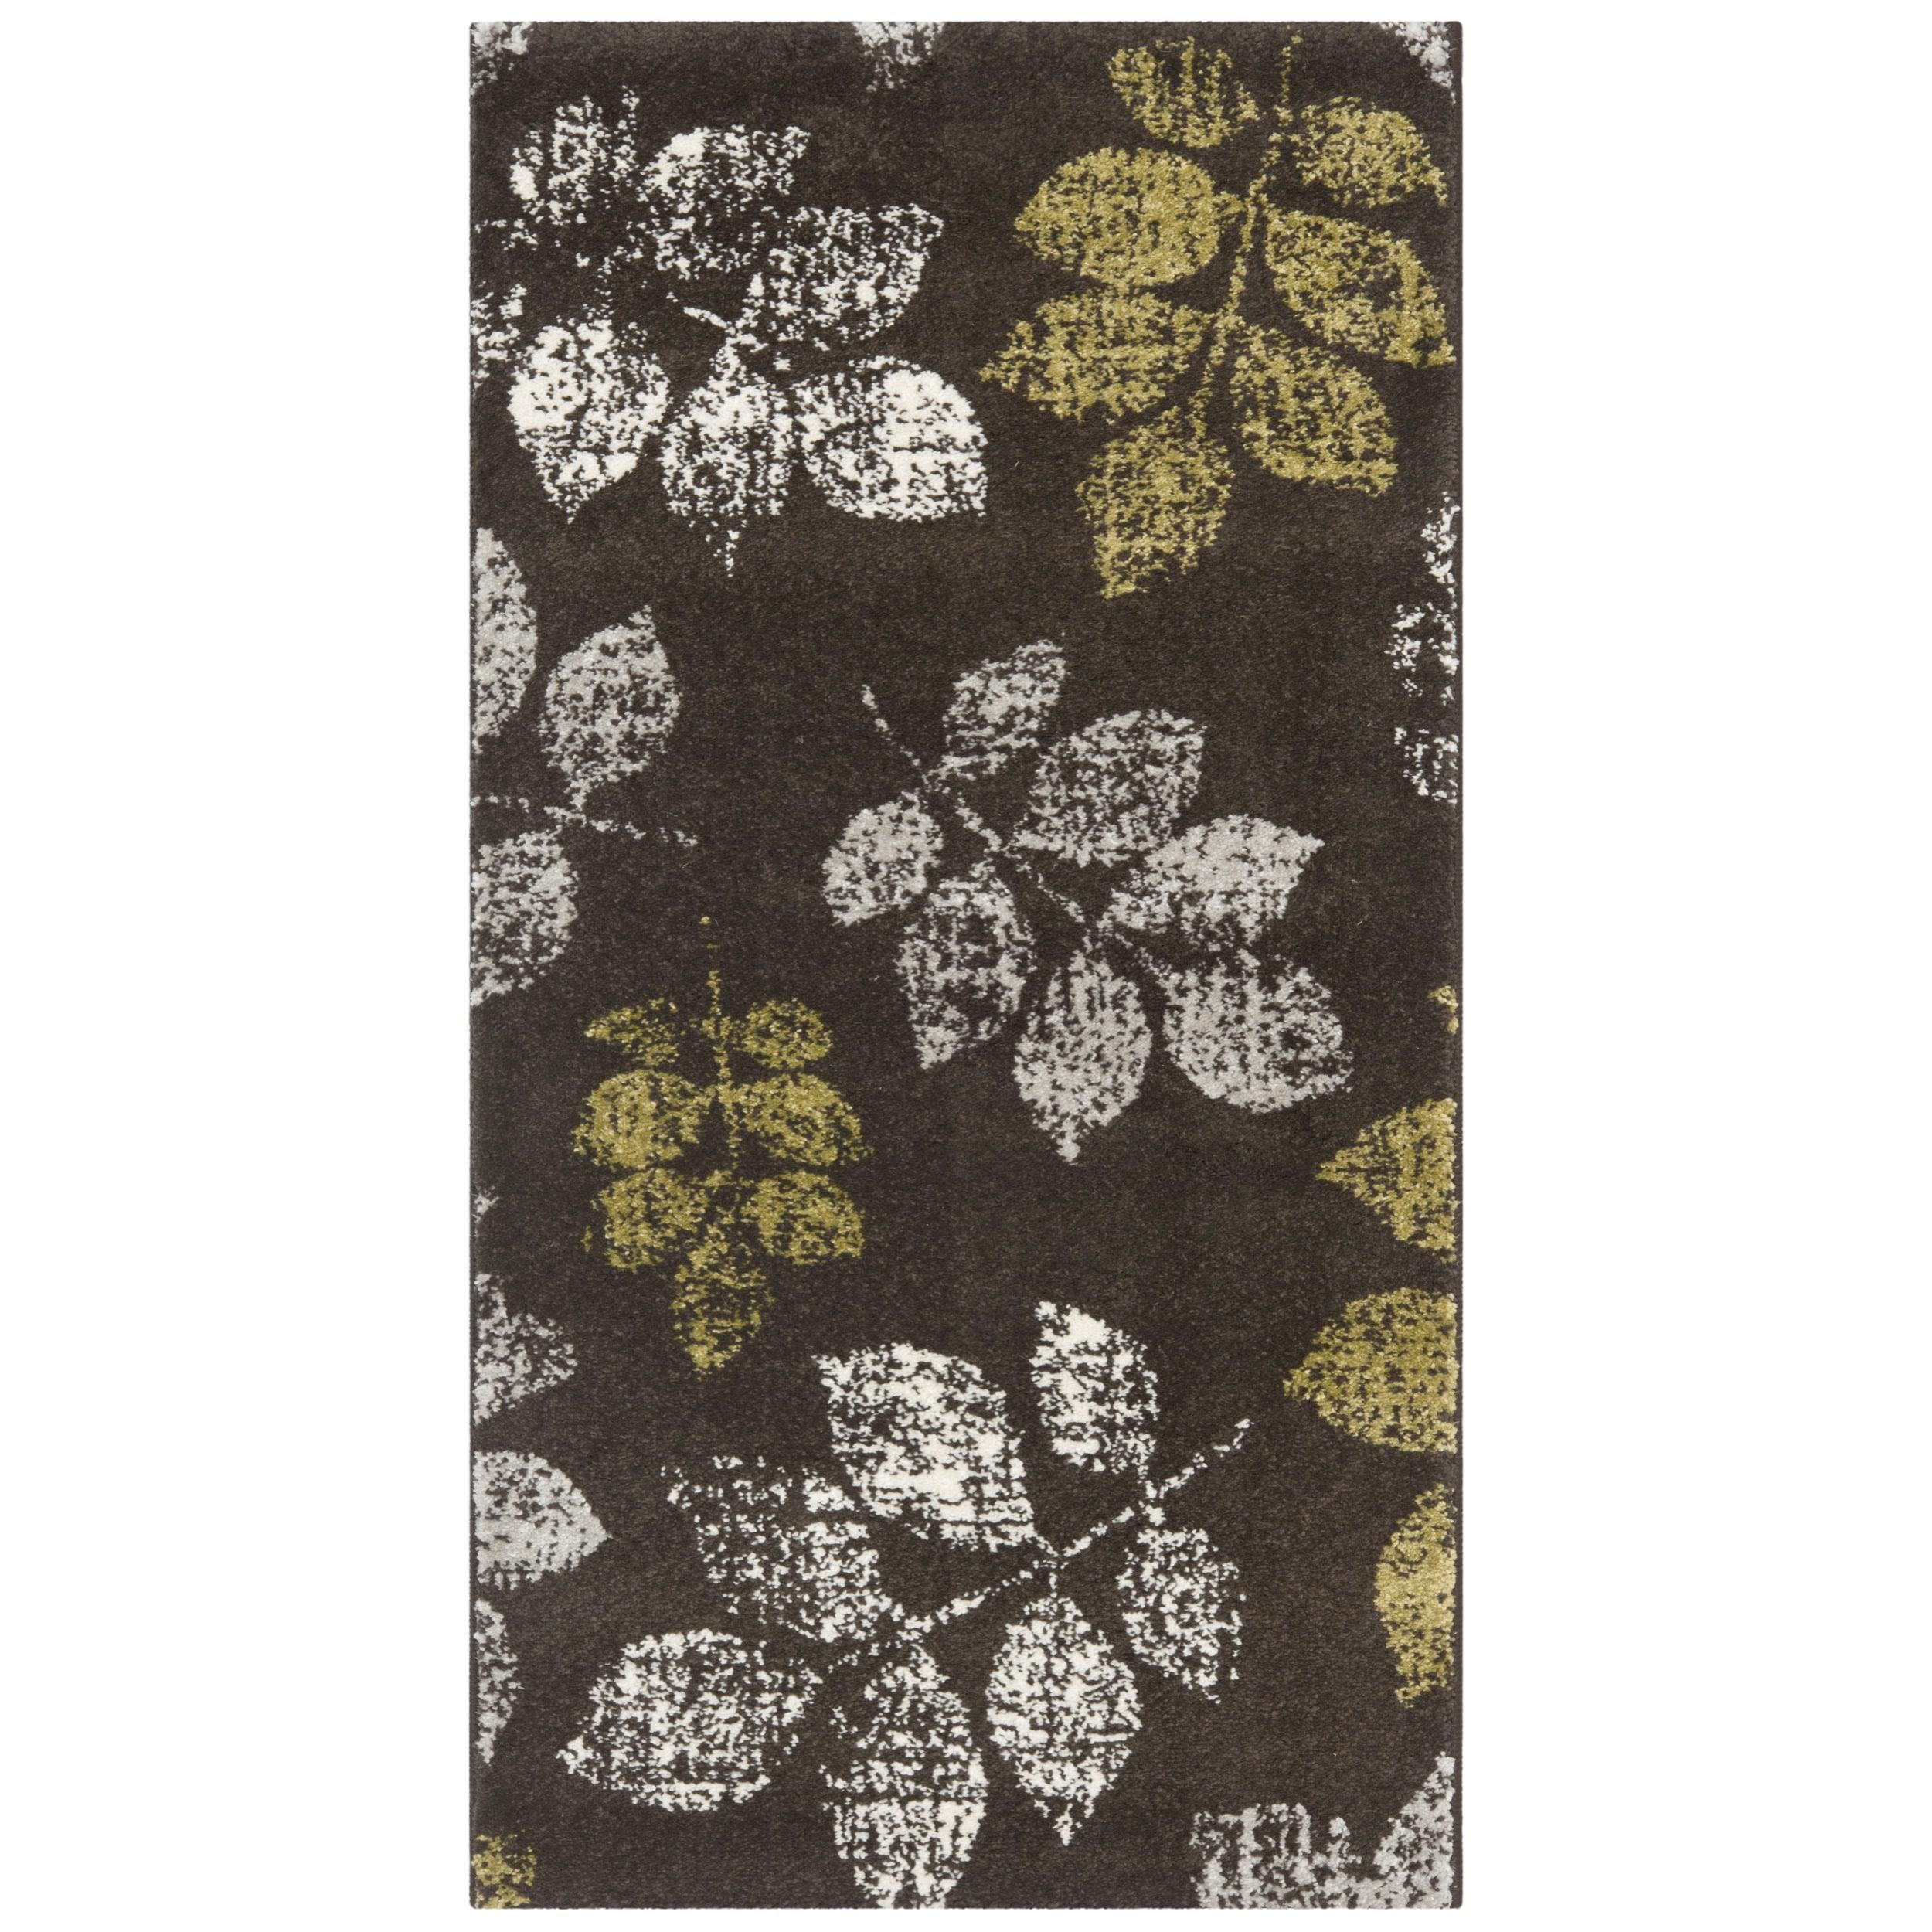 Safavieh Porcello Leaf Print Distressed Brown Green Rug 2 X 3 7